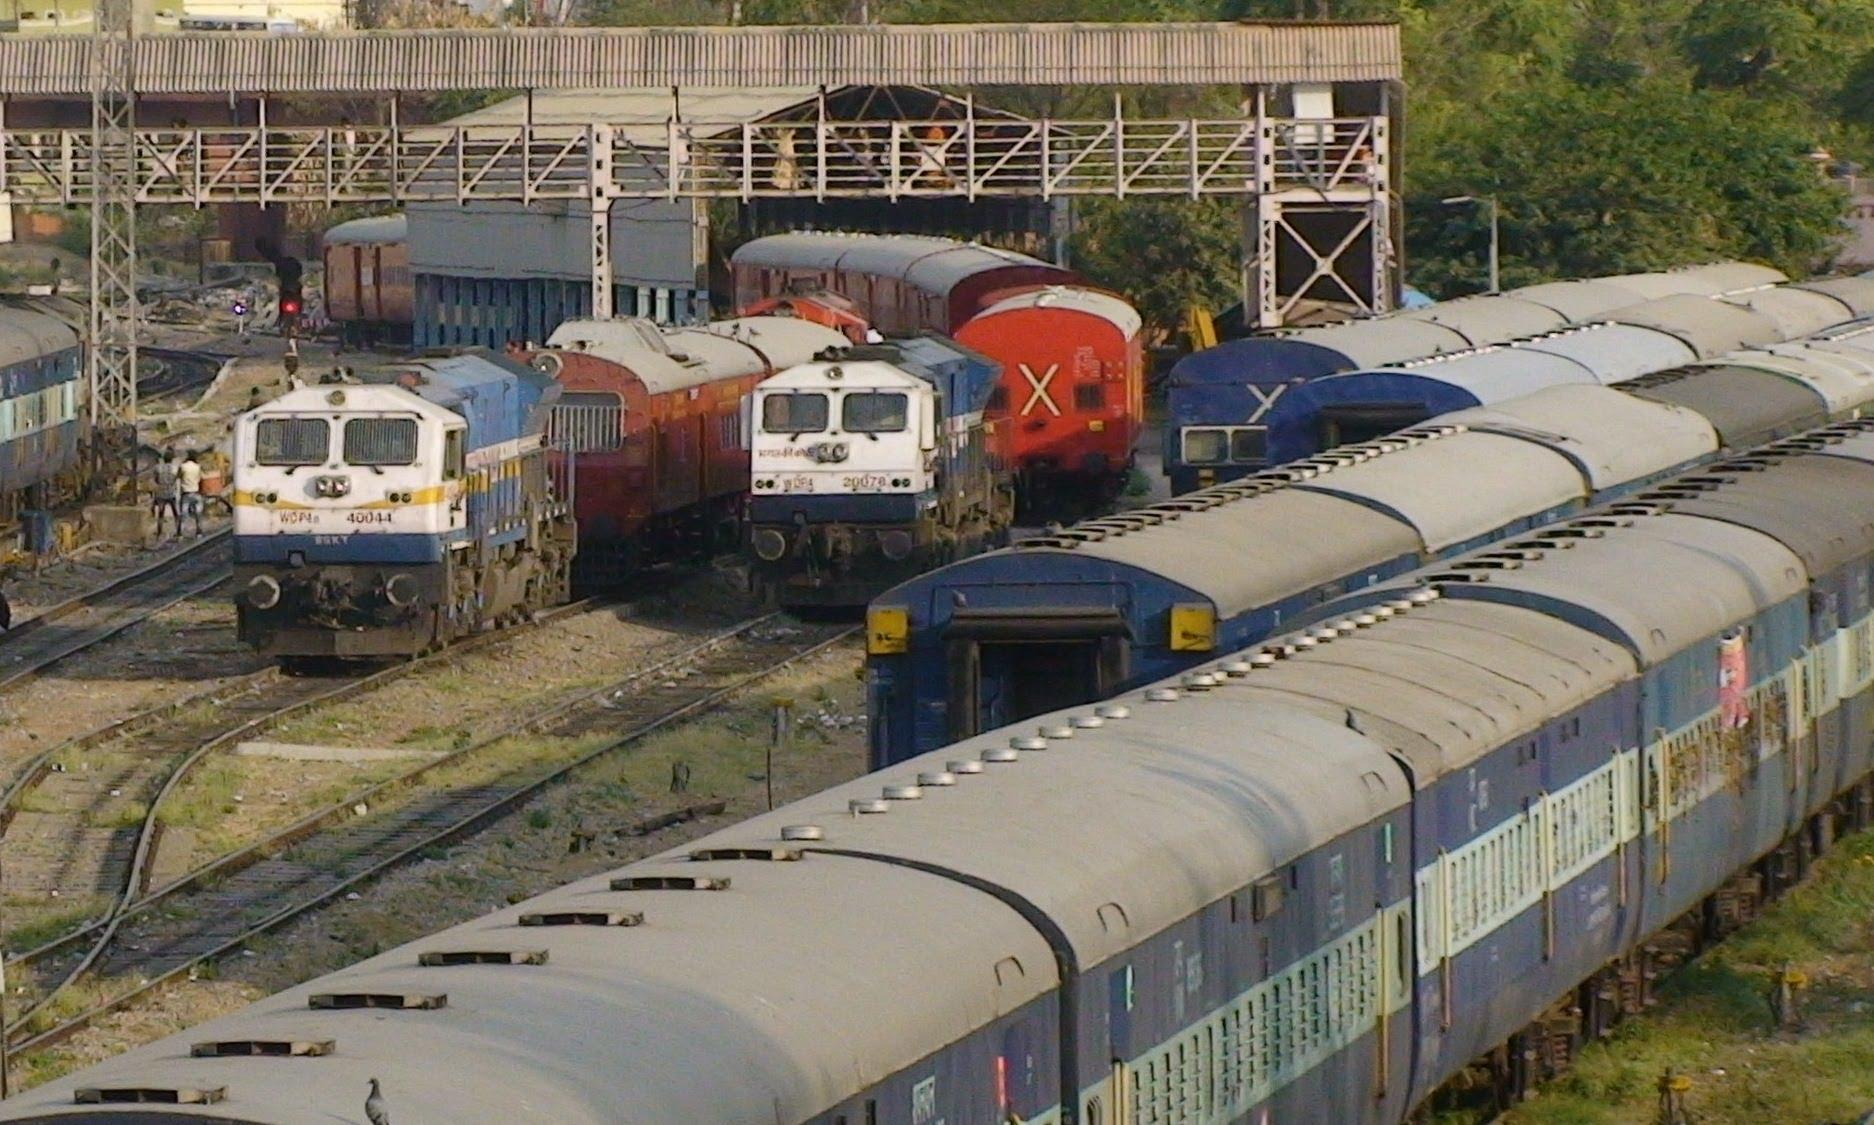 Train railways photo